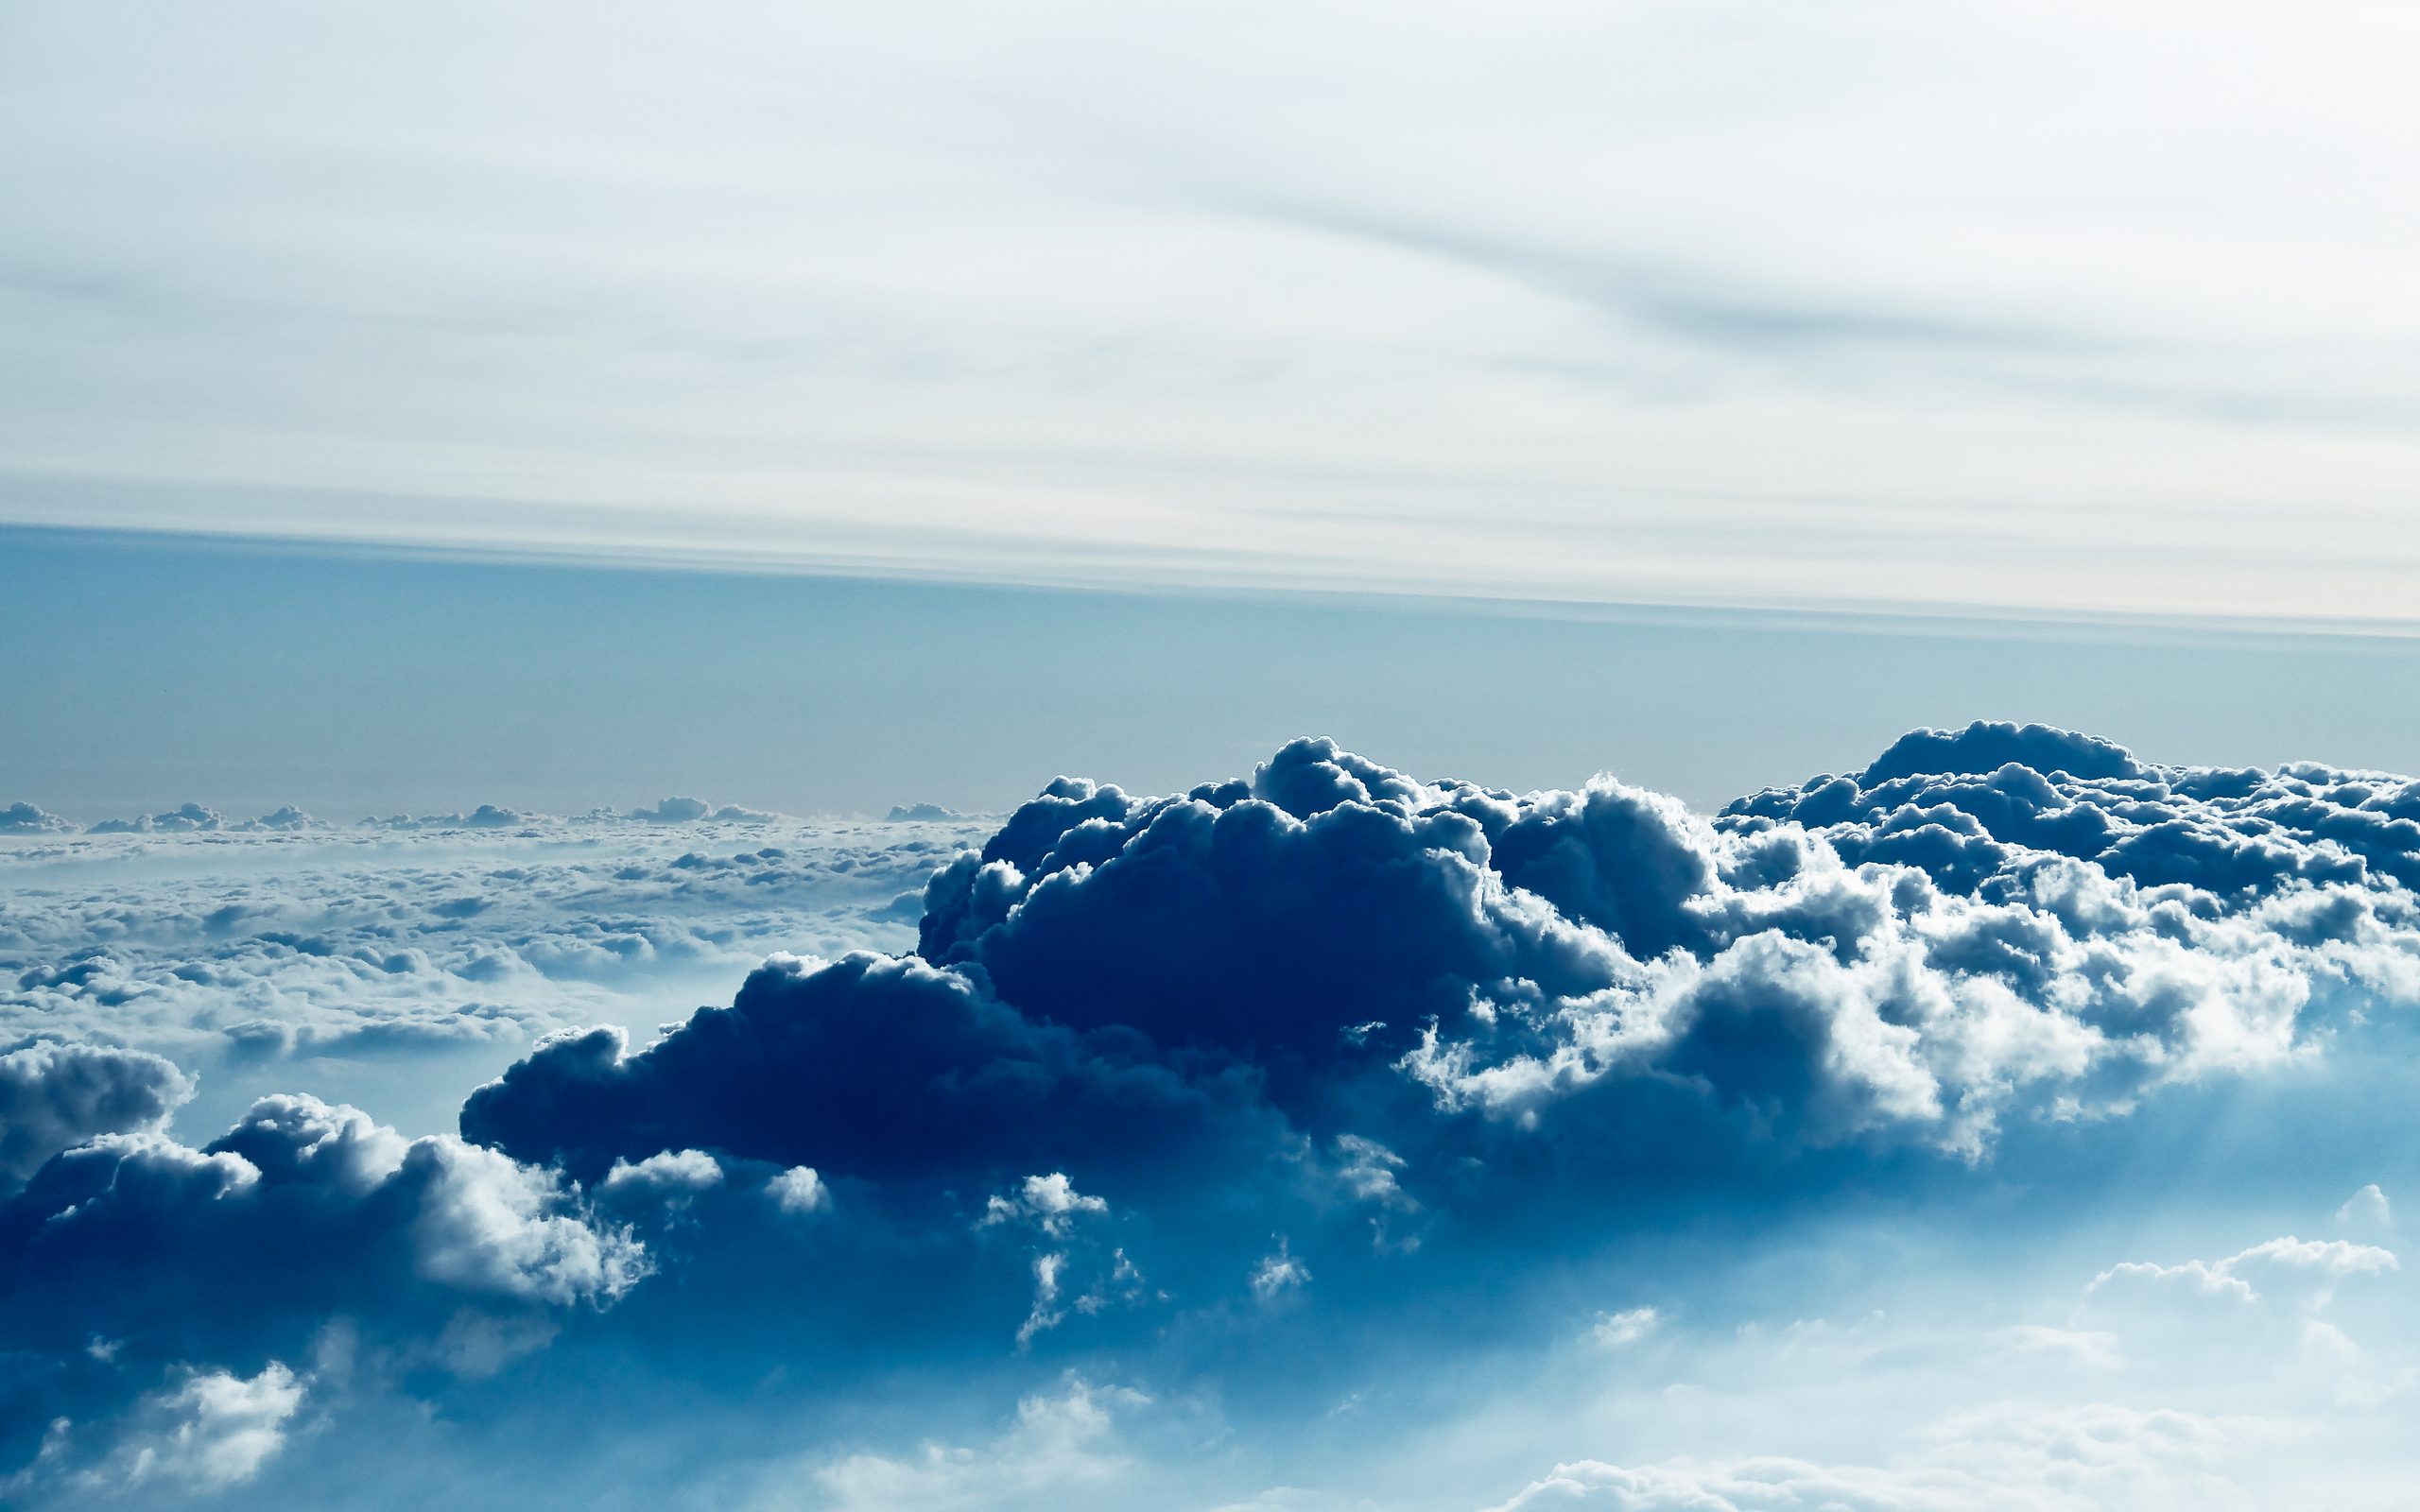 cloud Wallpaper Background 23463 2560x1600